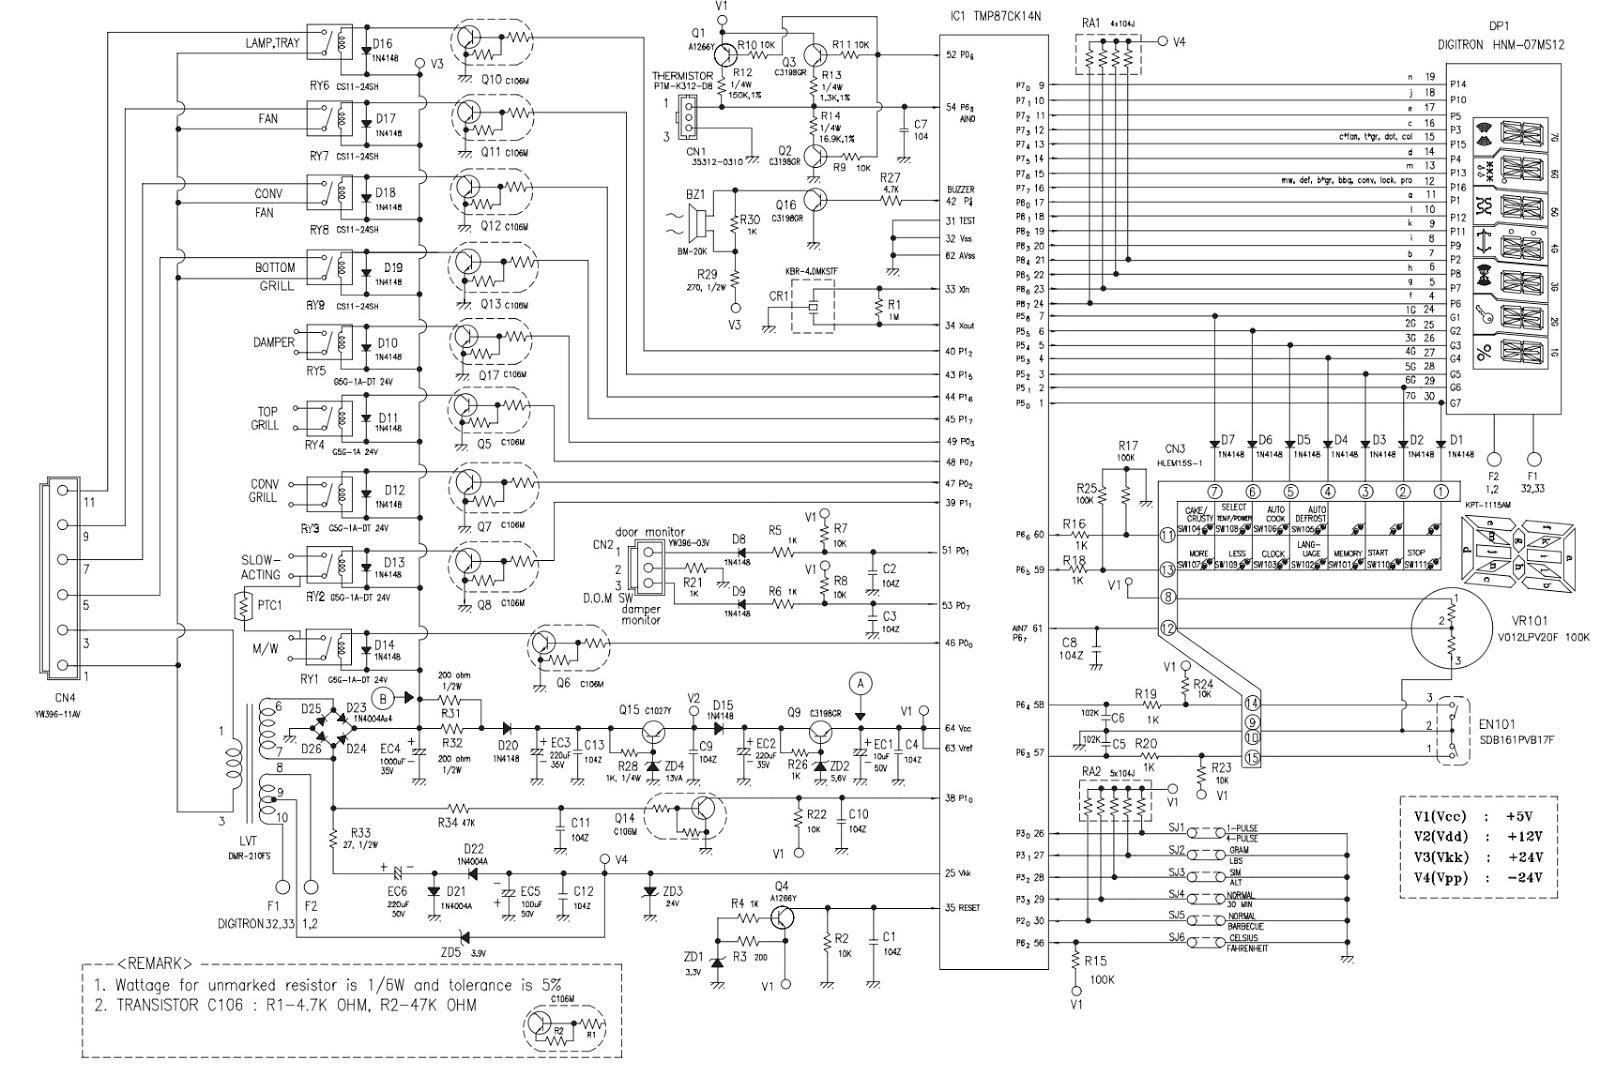 daewoo wiring harness diagram wiring diagram all data Fuel Pump Wiring Harness Diagram daewoo wiring harness diagram manual e books cub cadet wiring harness diagram daewoo wiring harness diagram